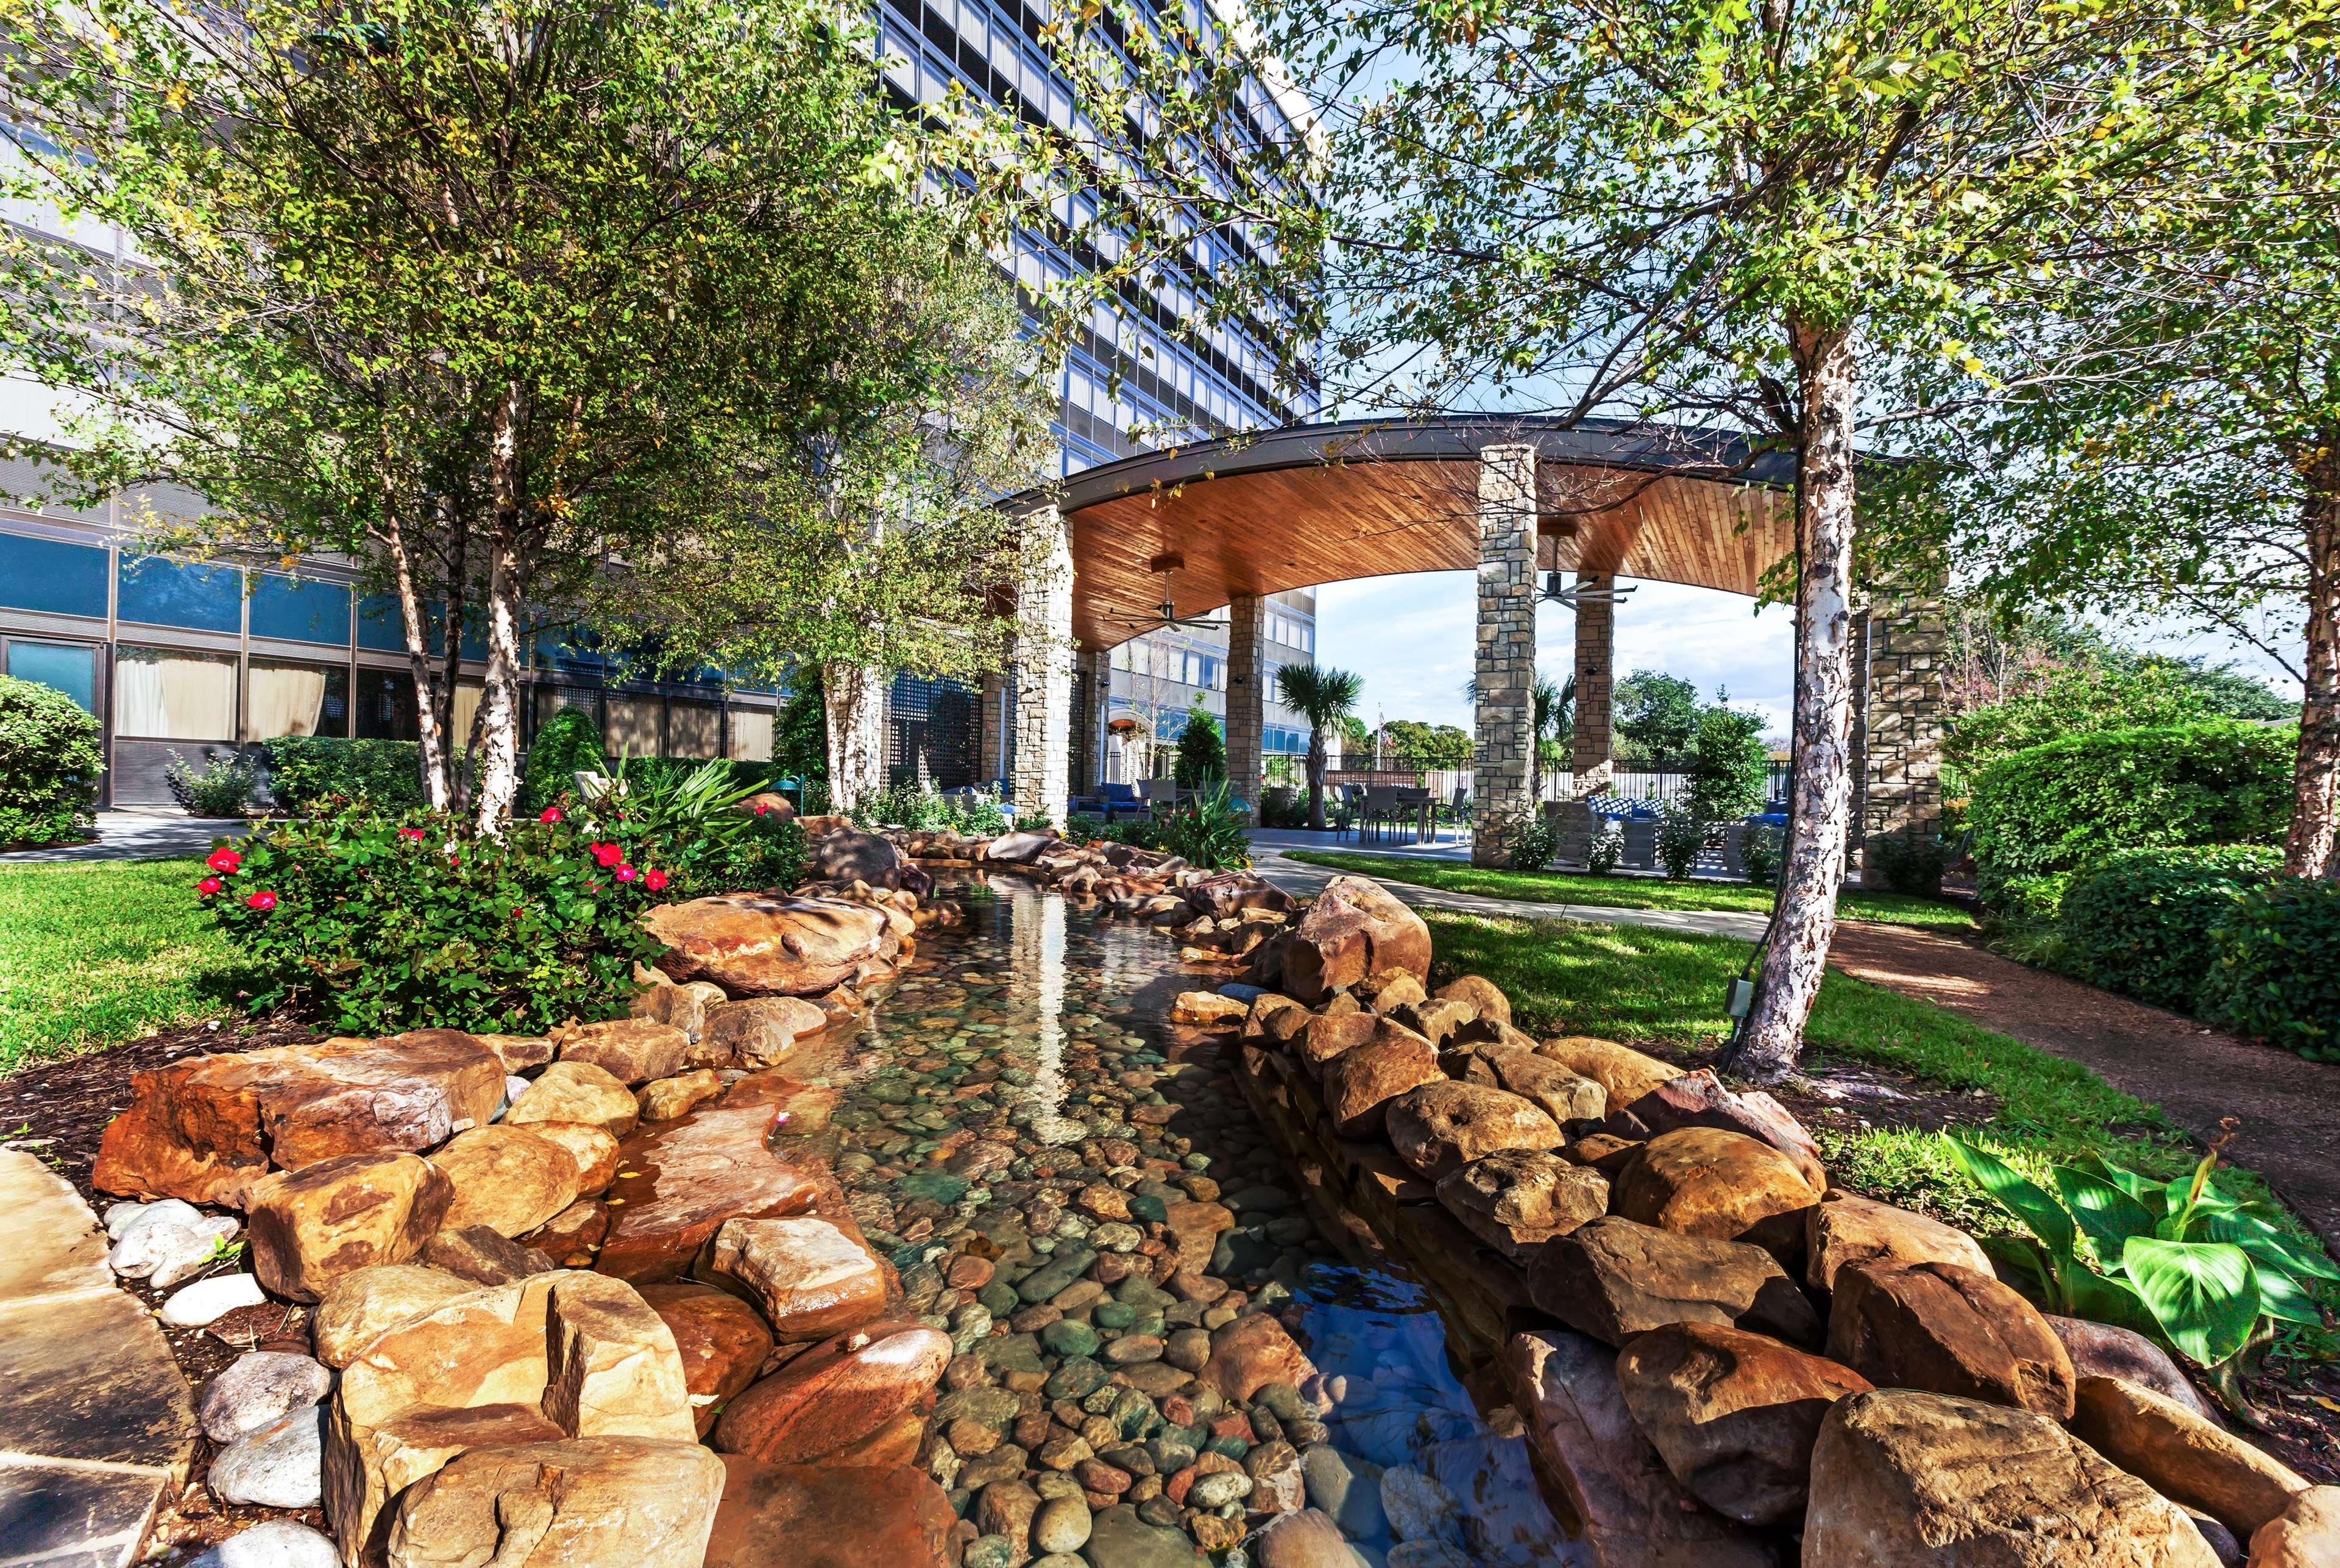 Hilton Waco image 14